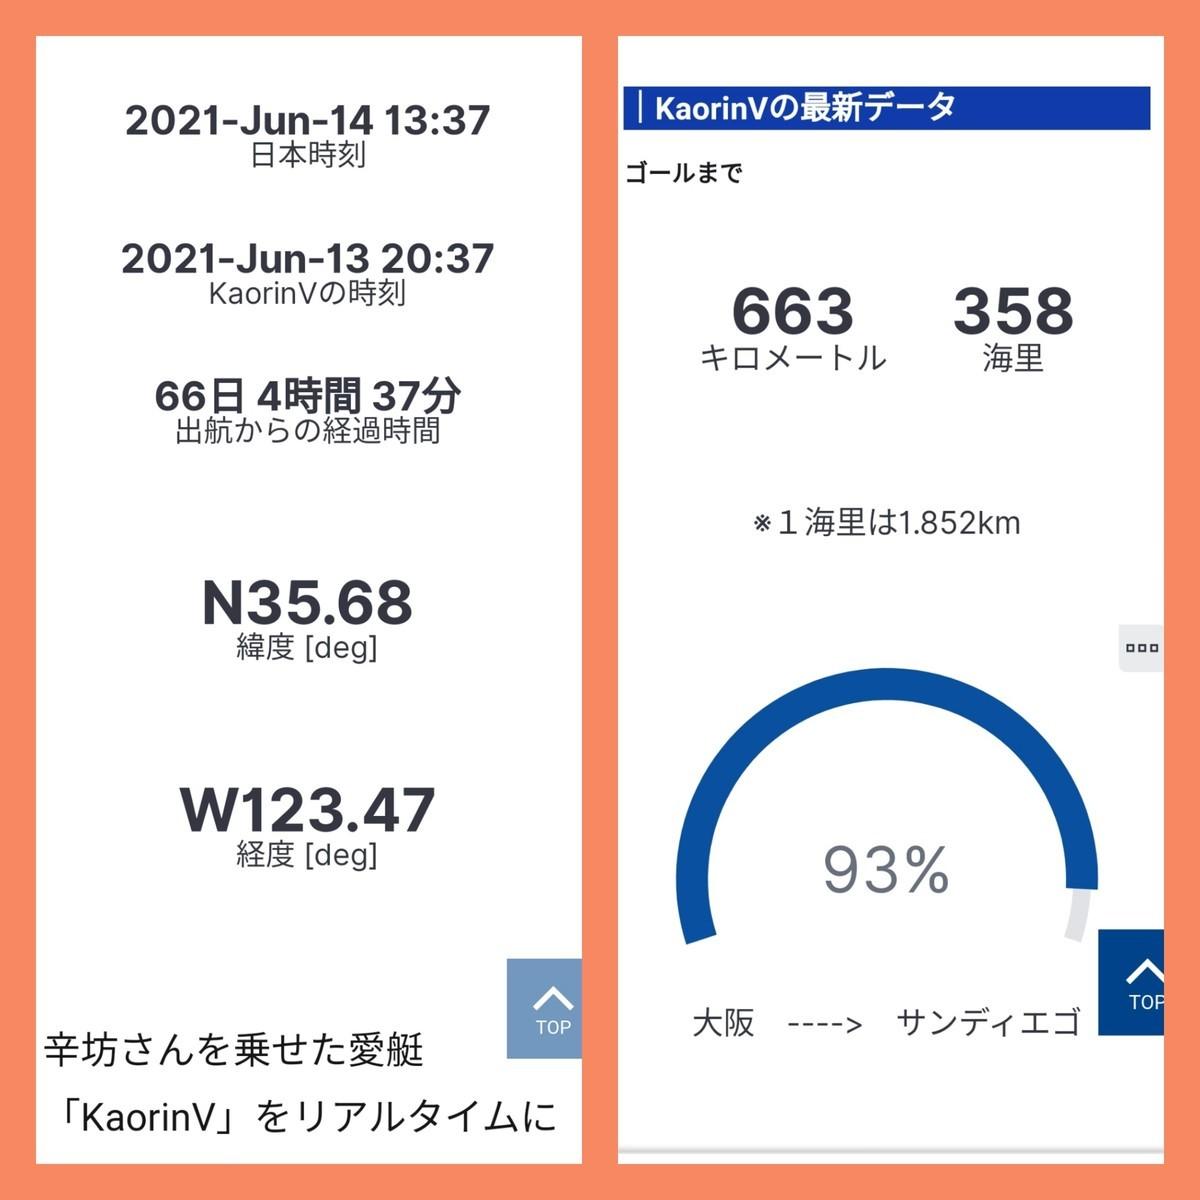 f:id:kandou:20210614140818j:plain